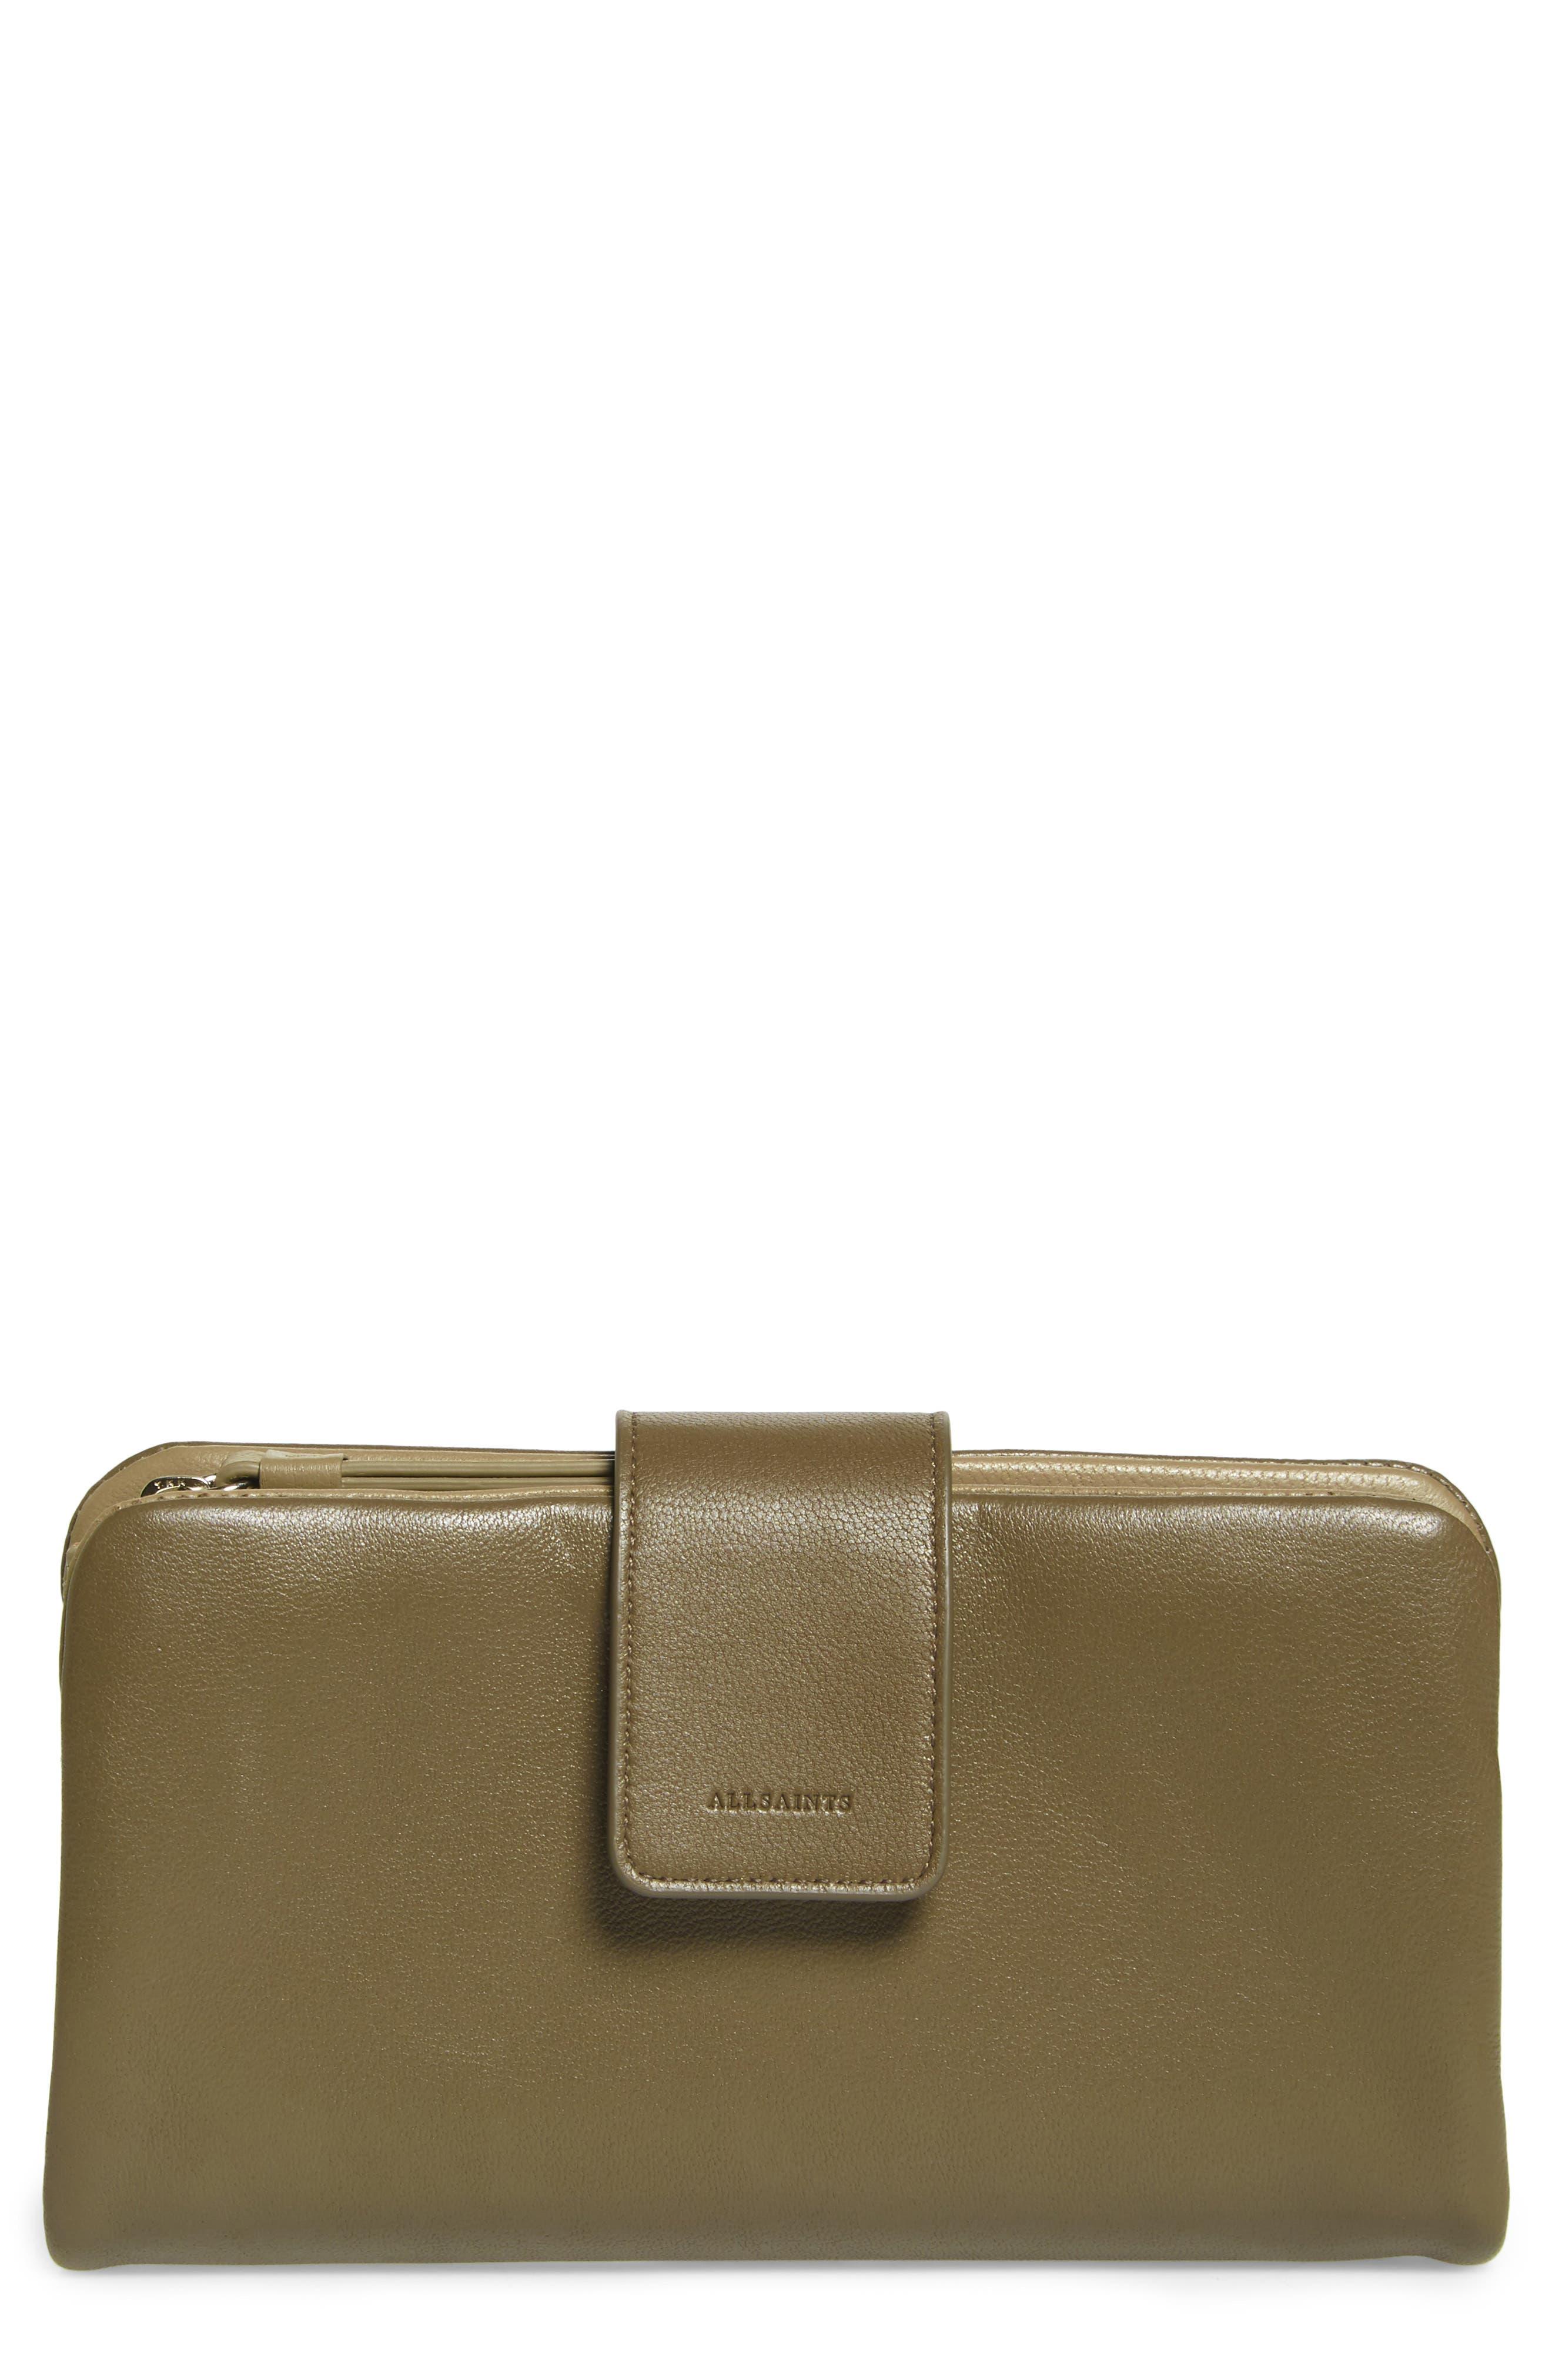 ALLSAINTS Paradise Lambskin Leather Wallet